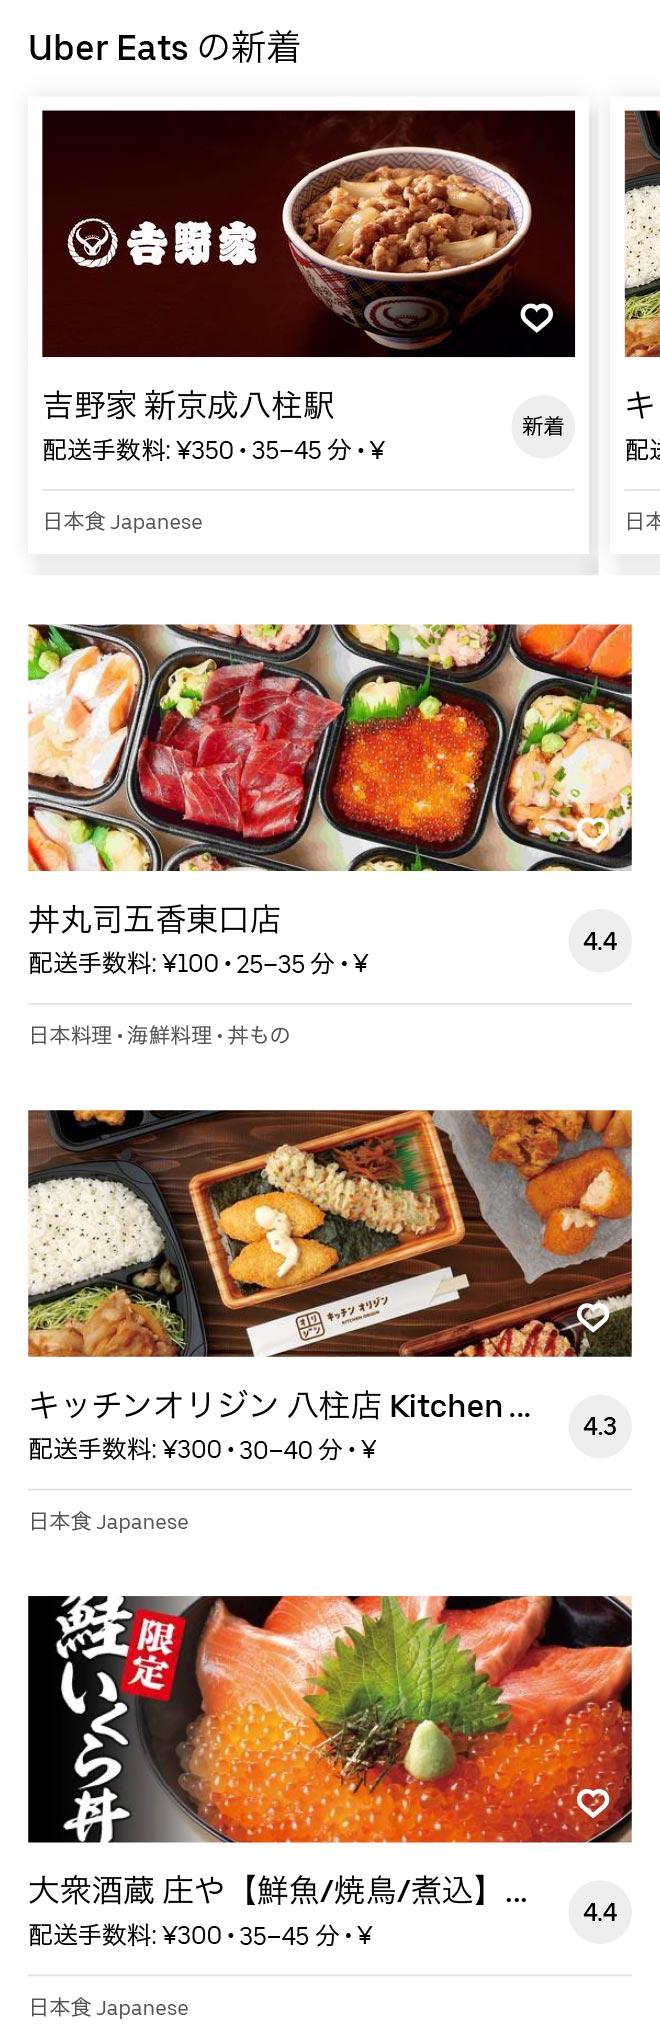 Gokou menu 2007 02